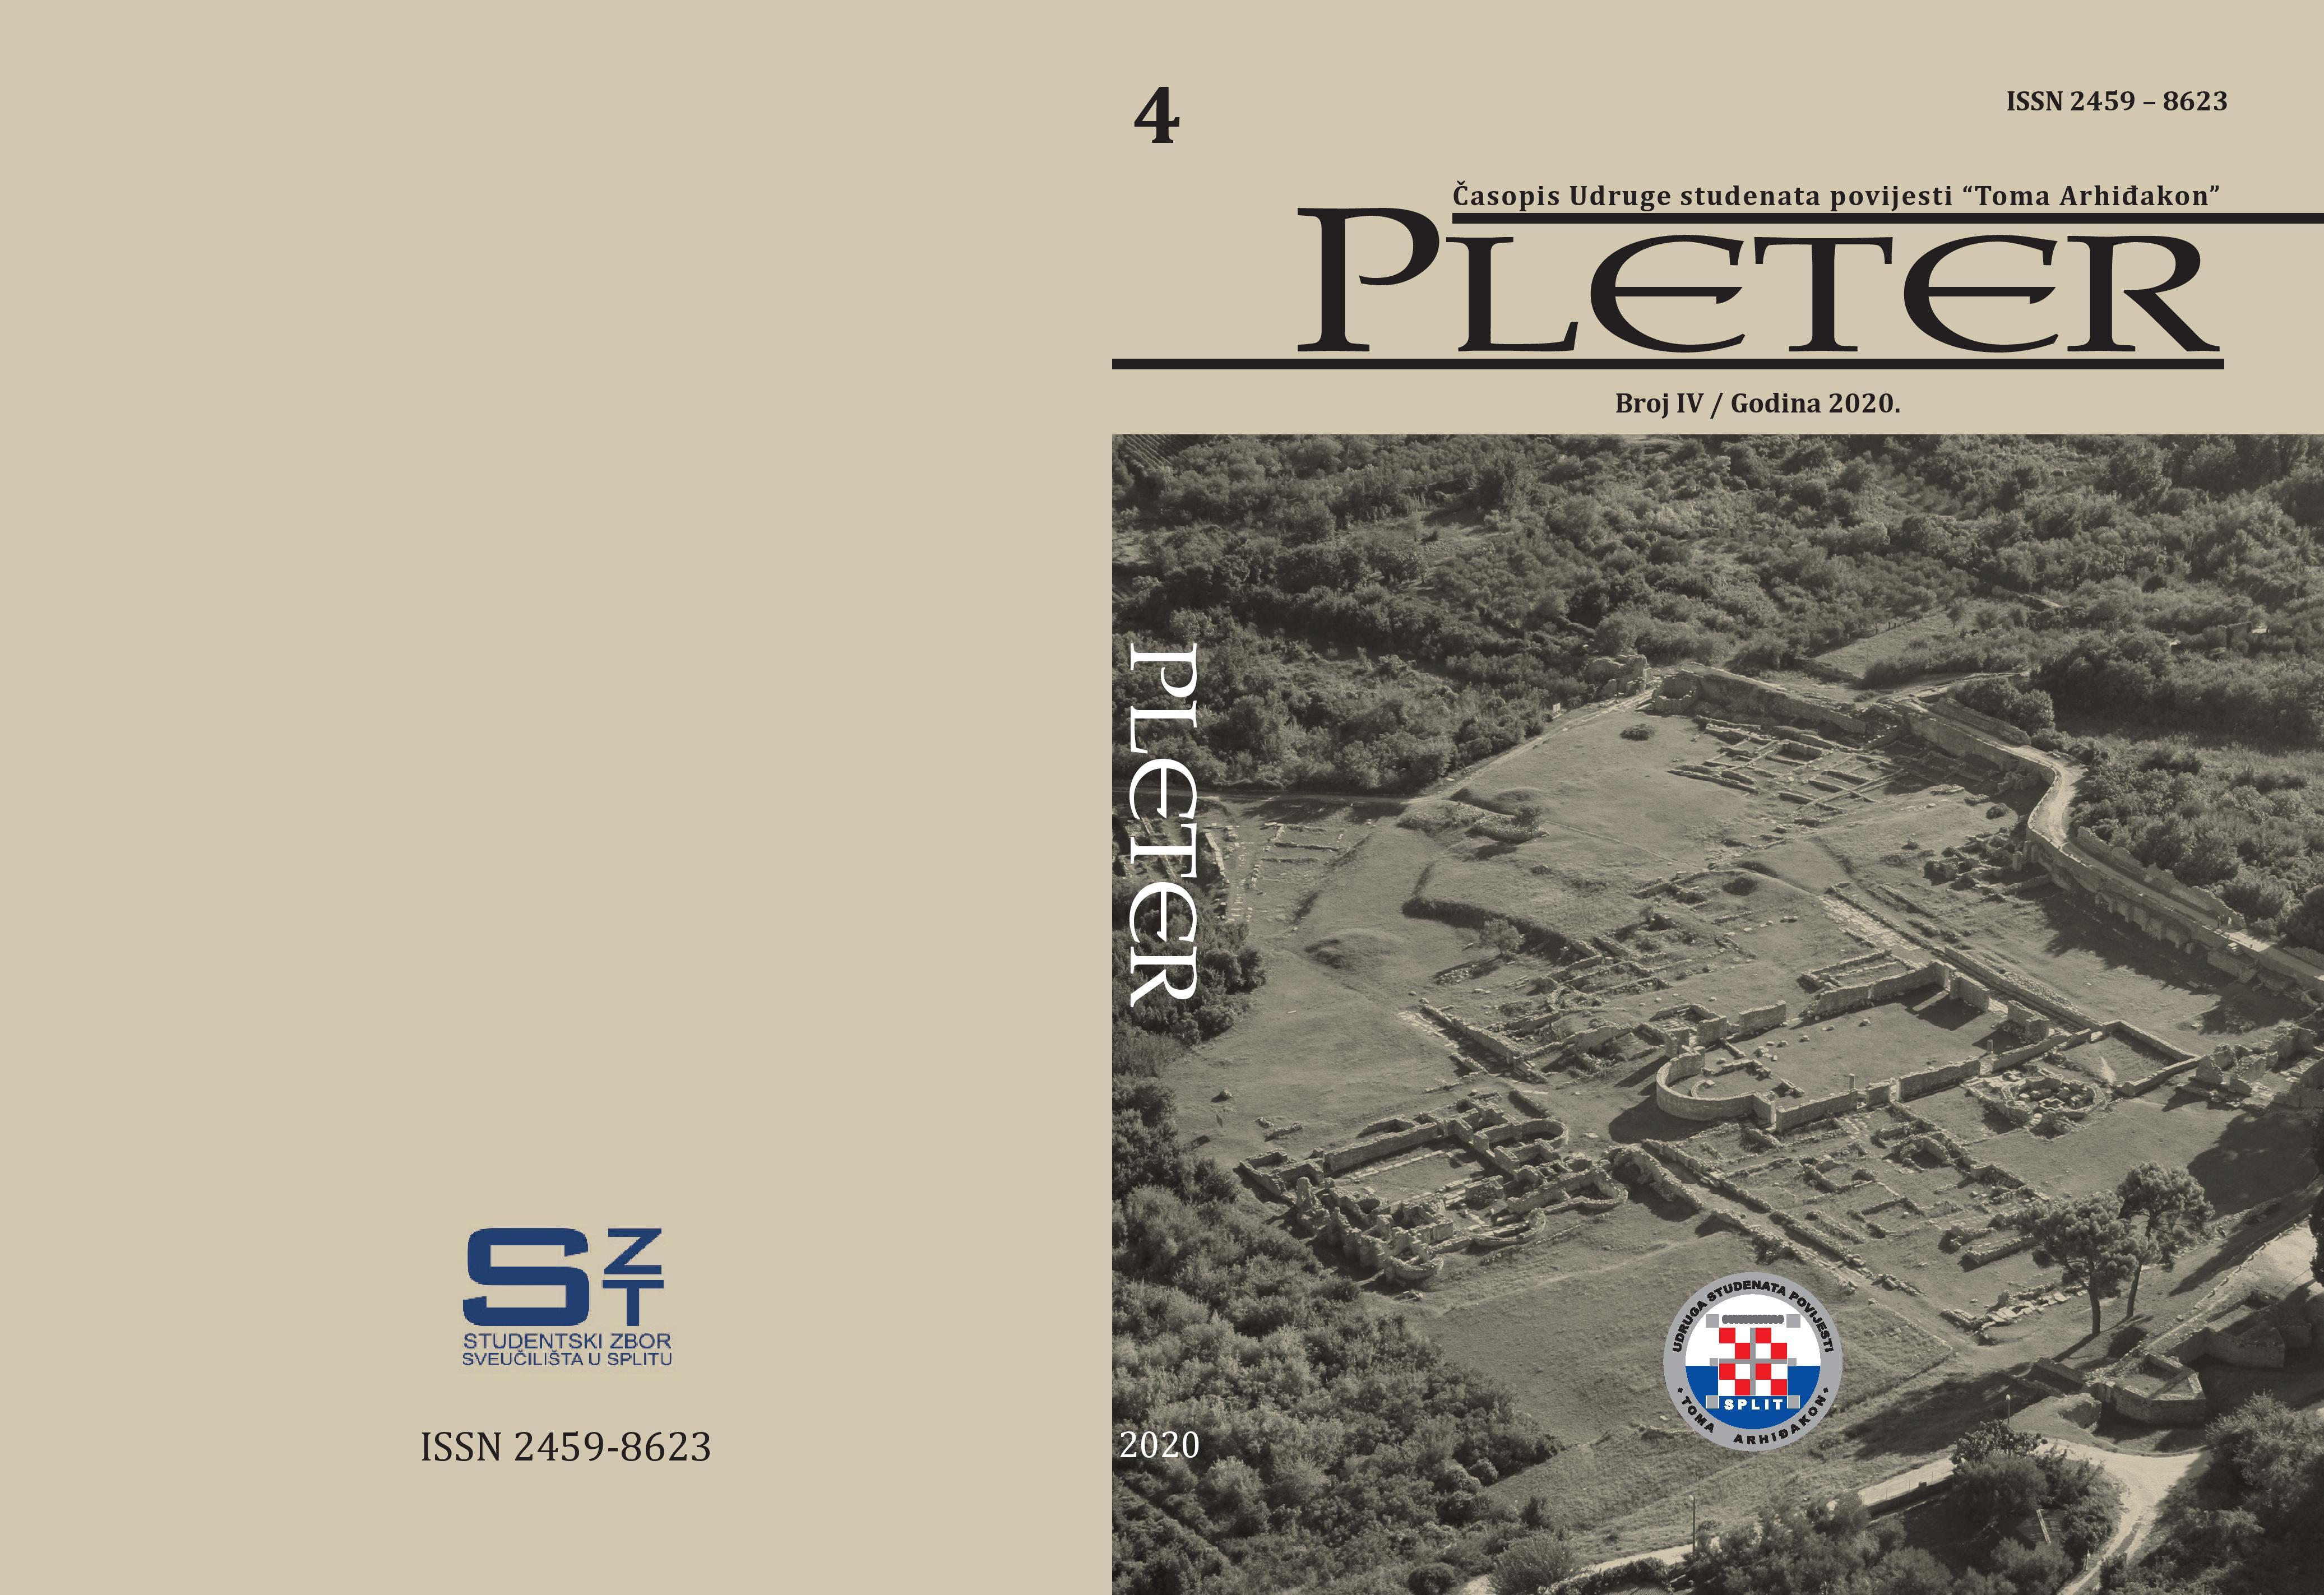 View Vol. 4 (2020): Volume 4, 2020